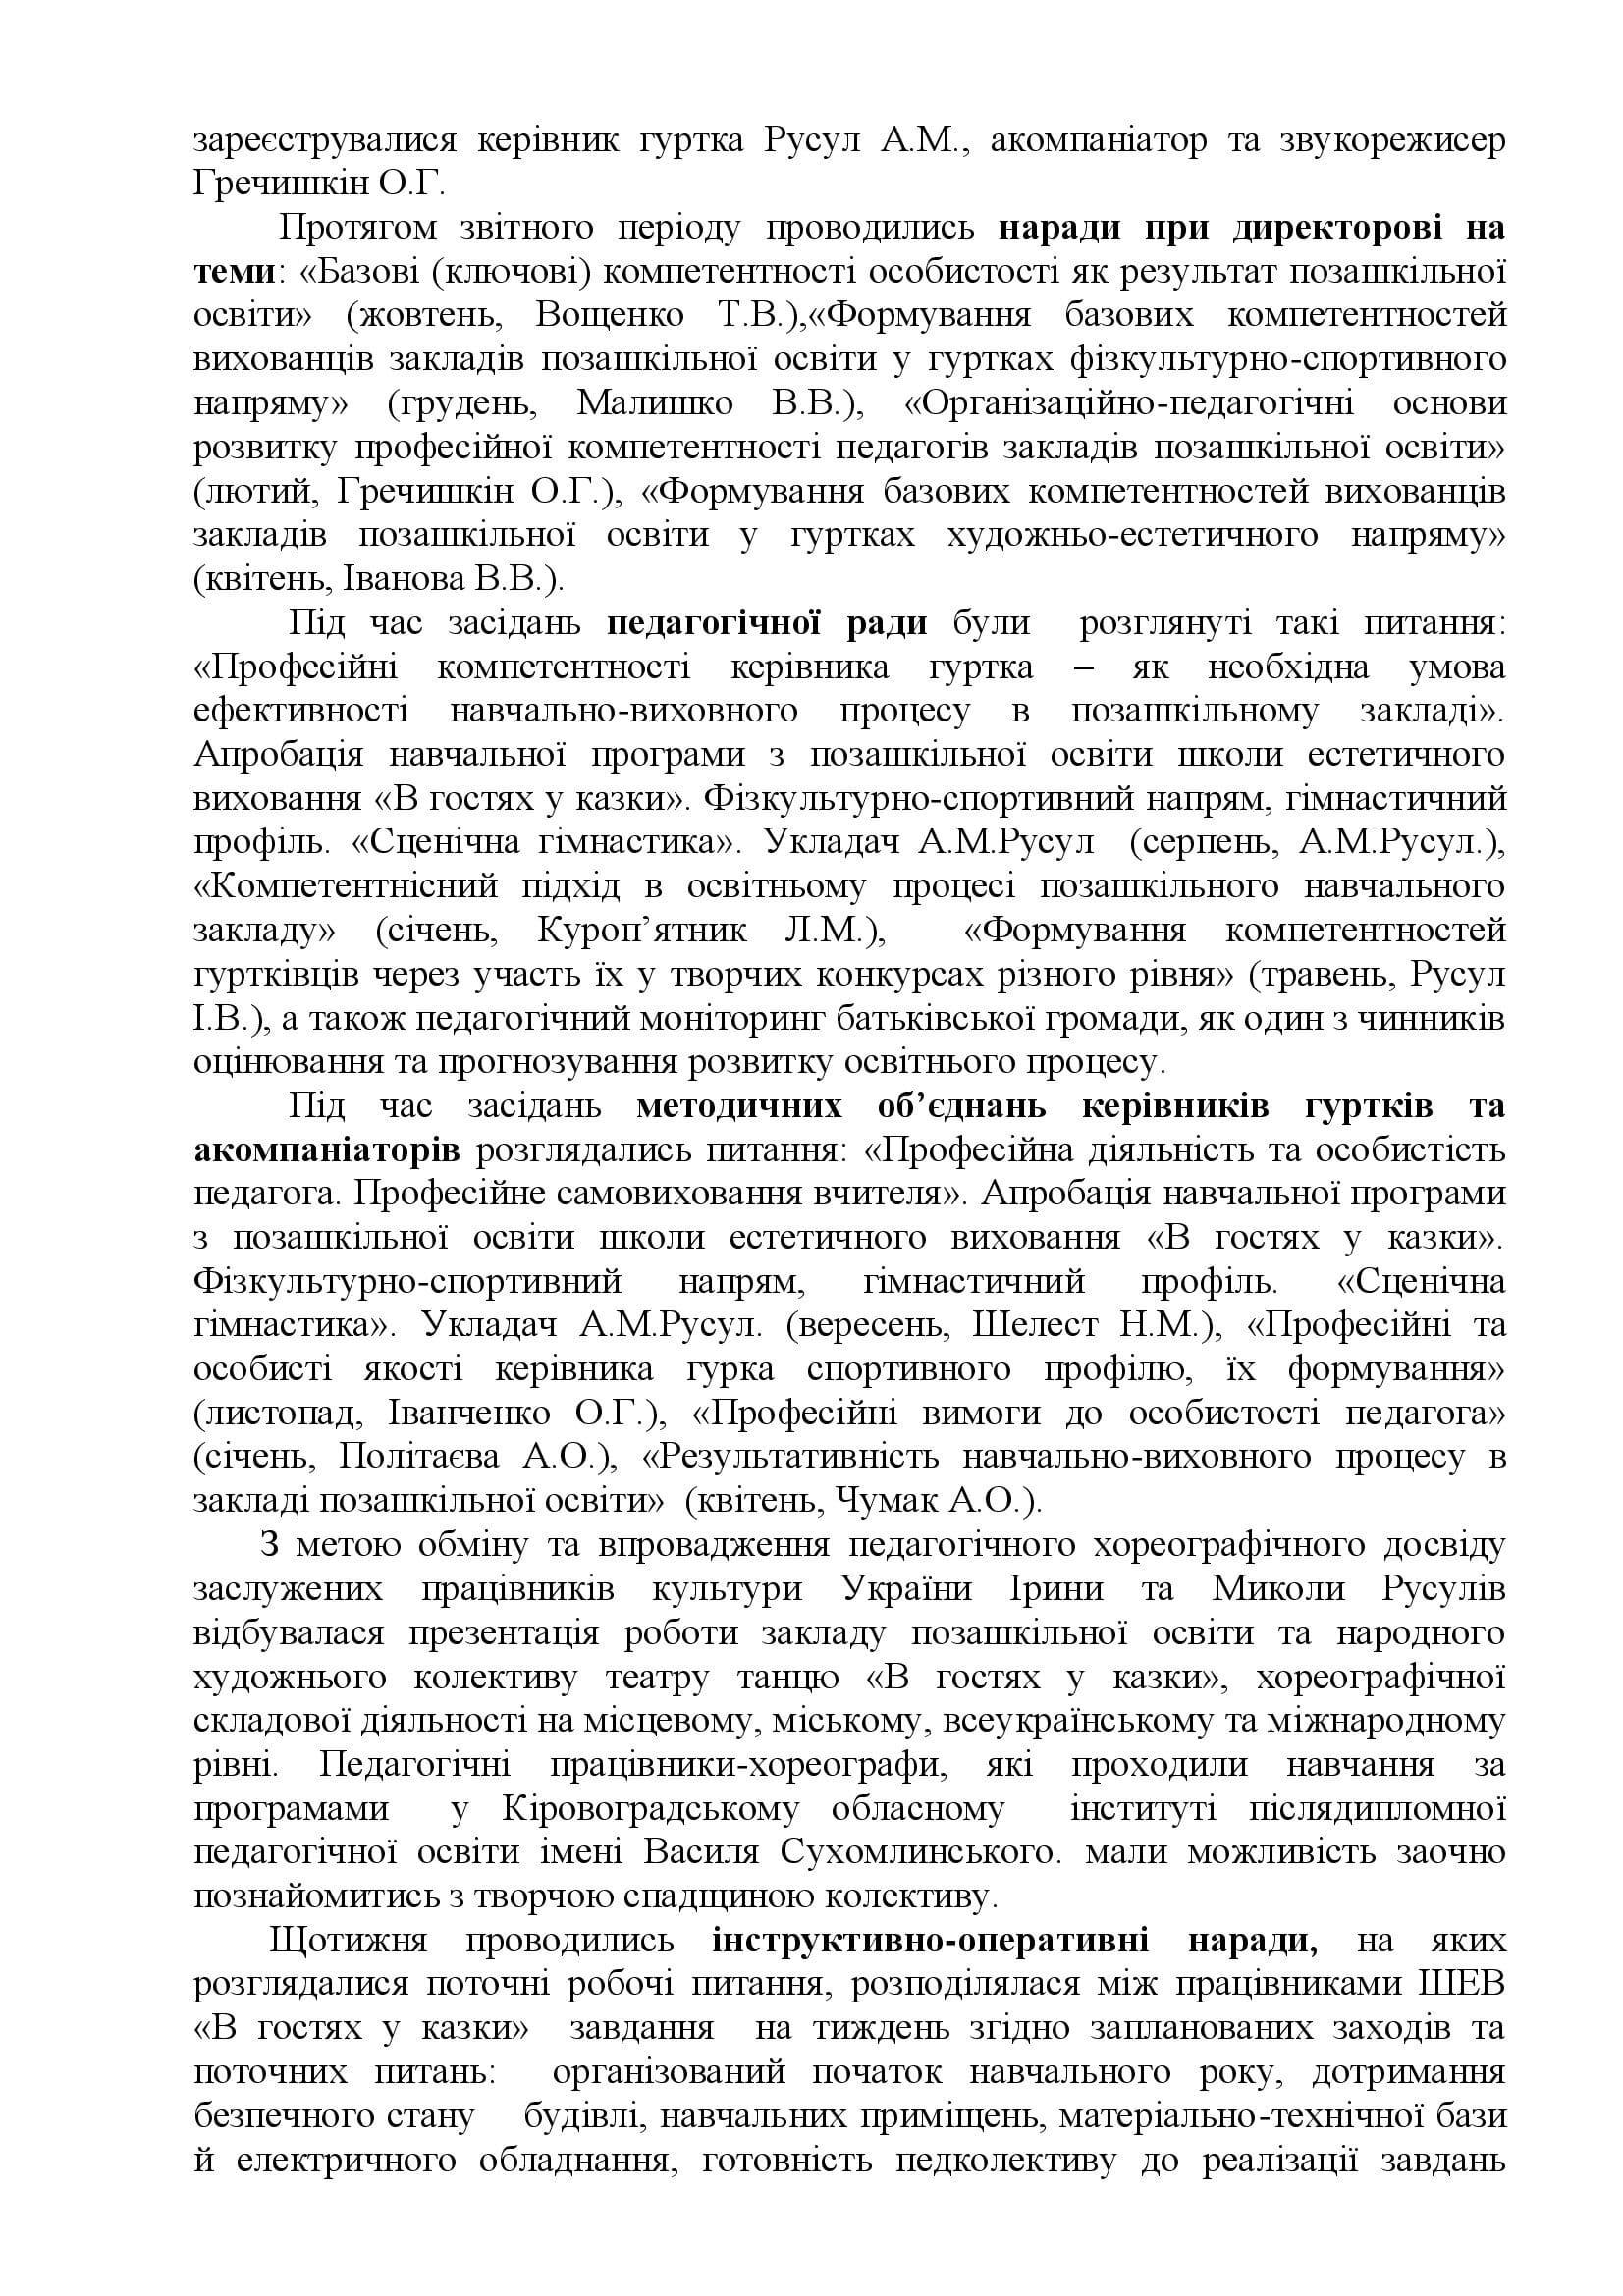 План роботи ШЕВ В гостях у казки  2021-2022_00005